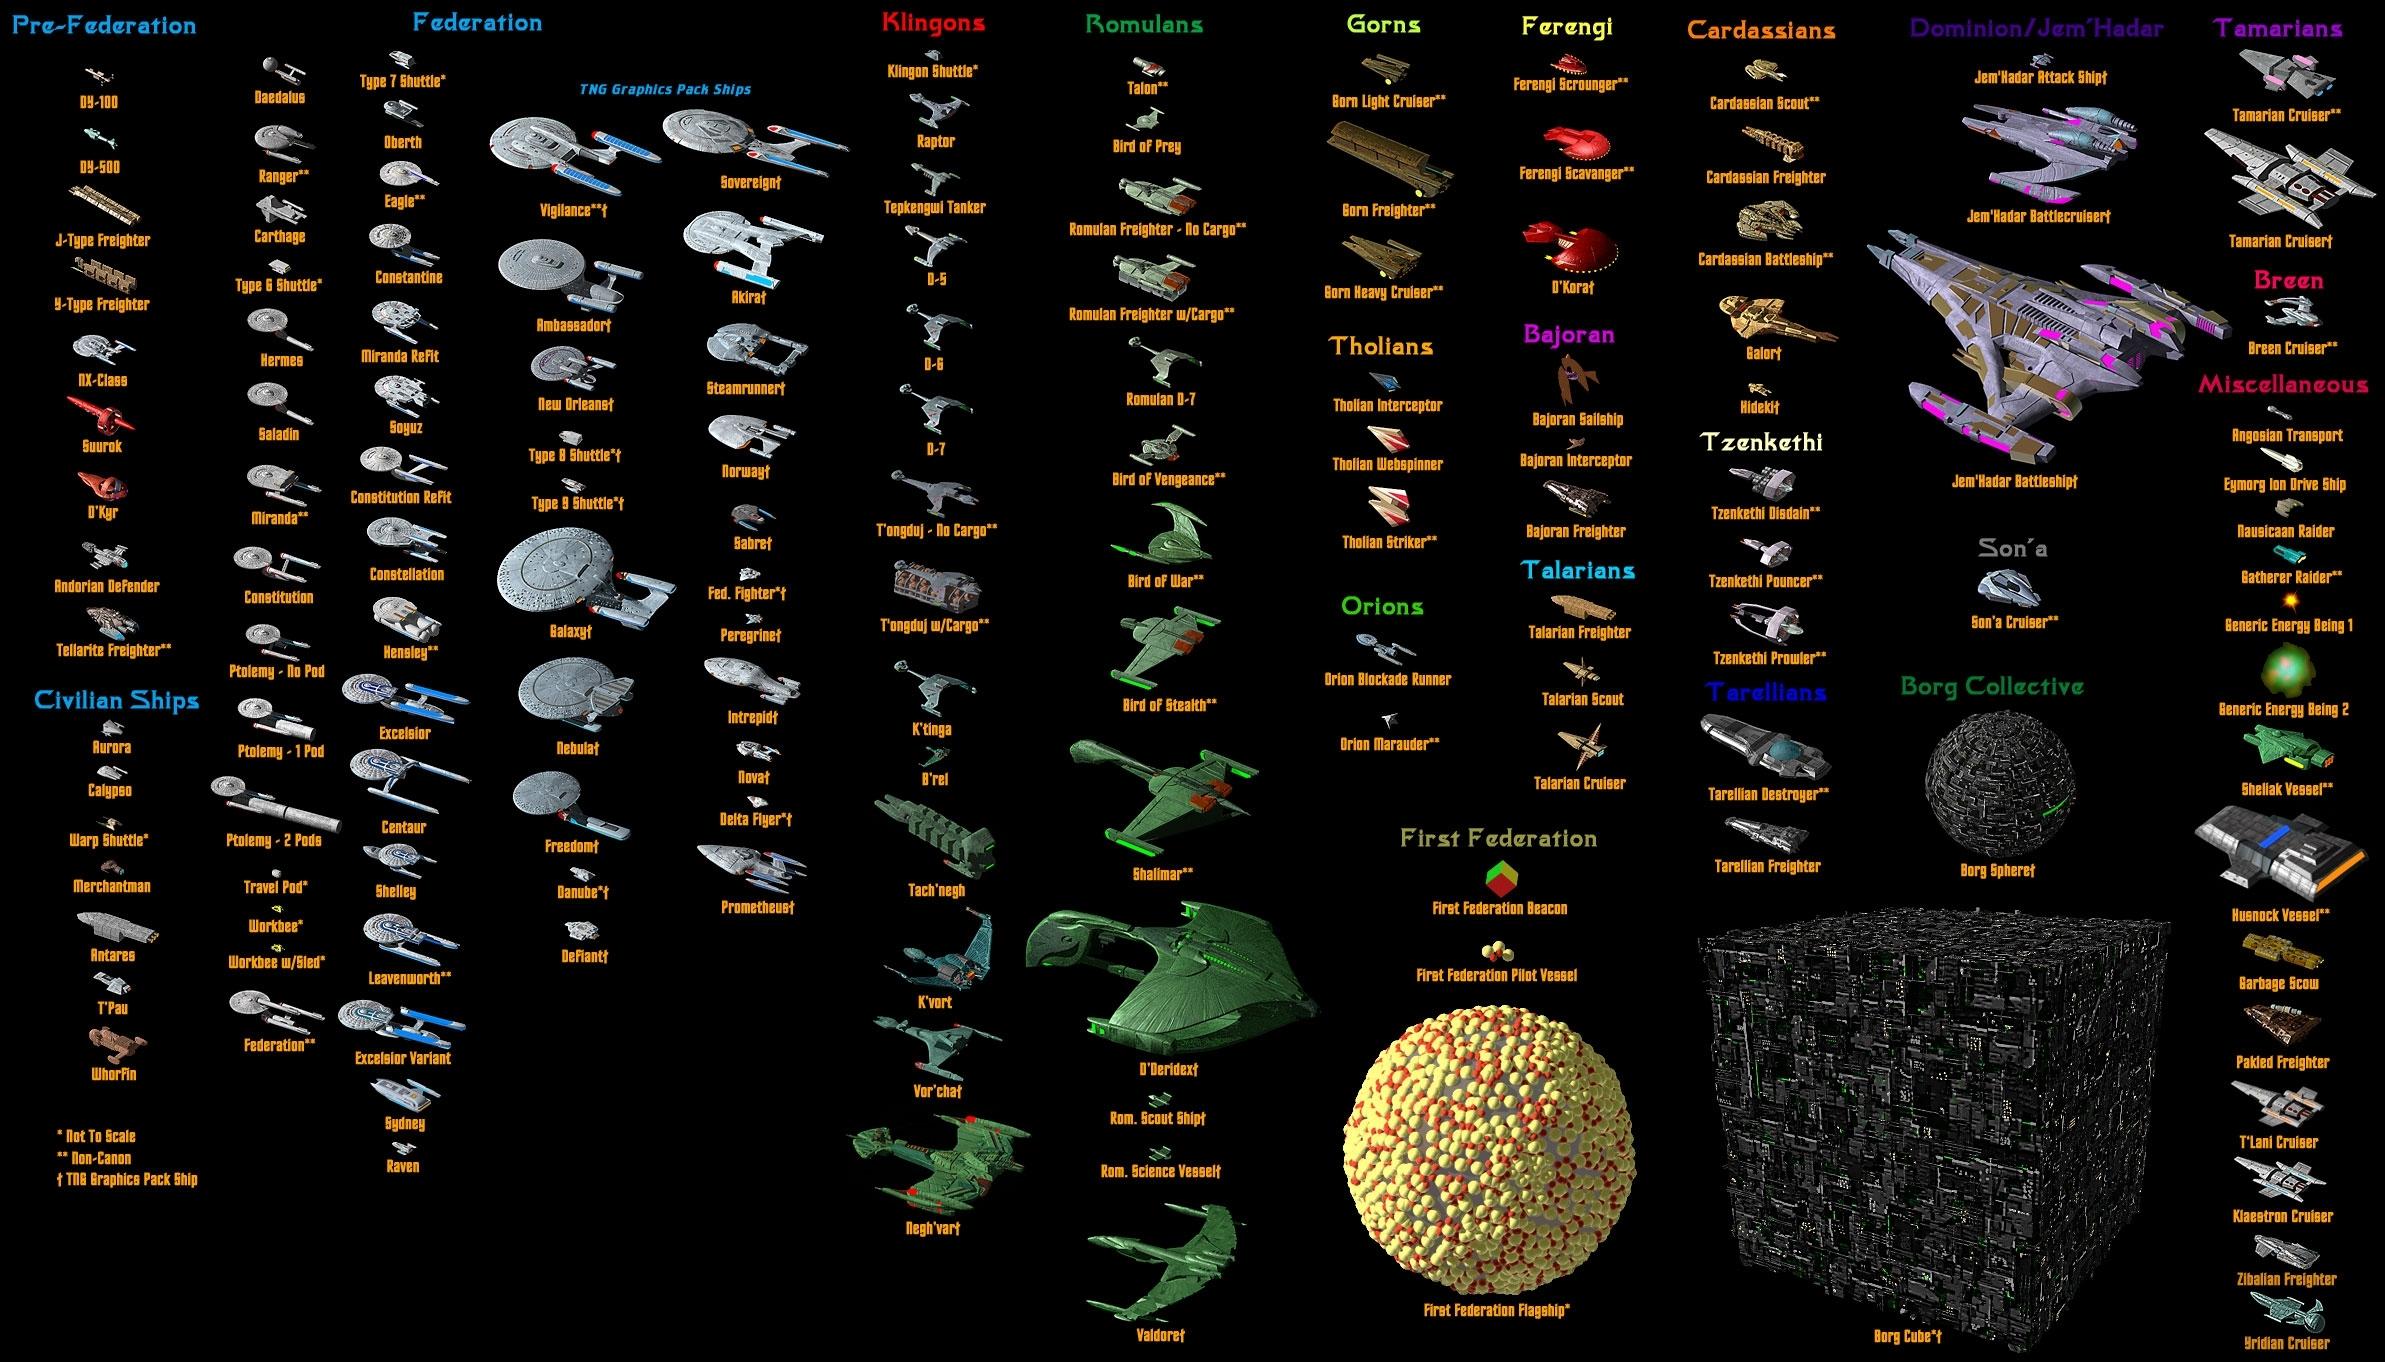 1313 star trek fonds d'écran hd | arrière-plans - wallpaper abyss